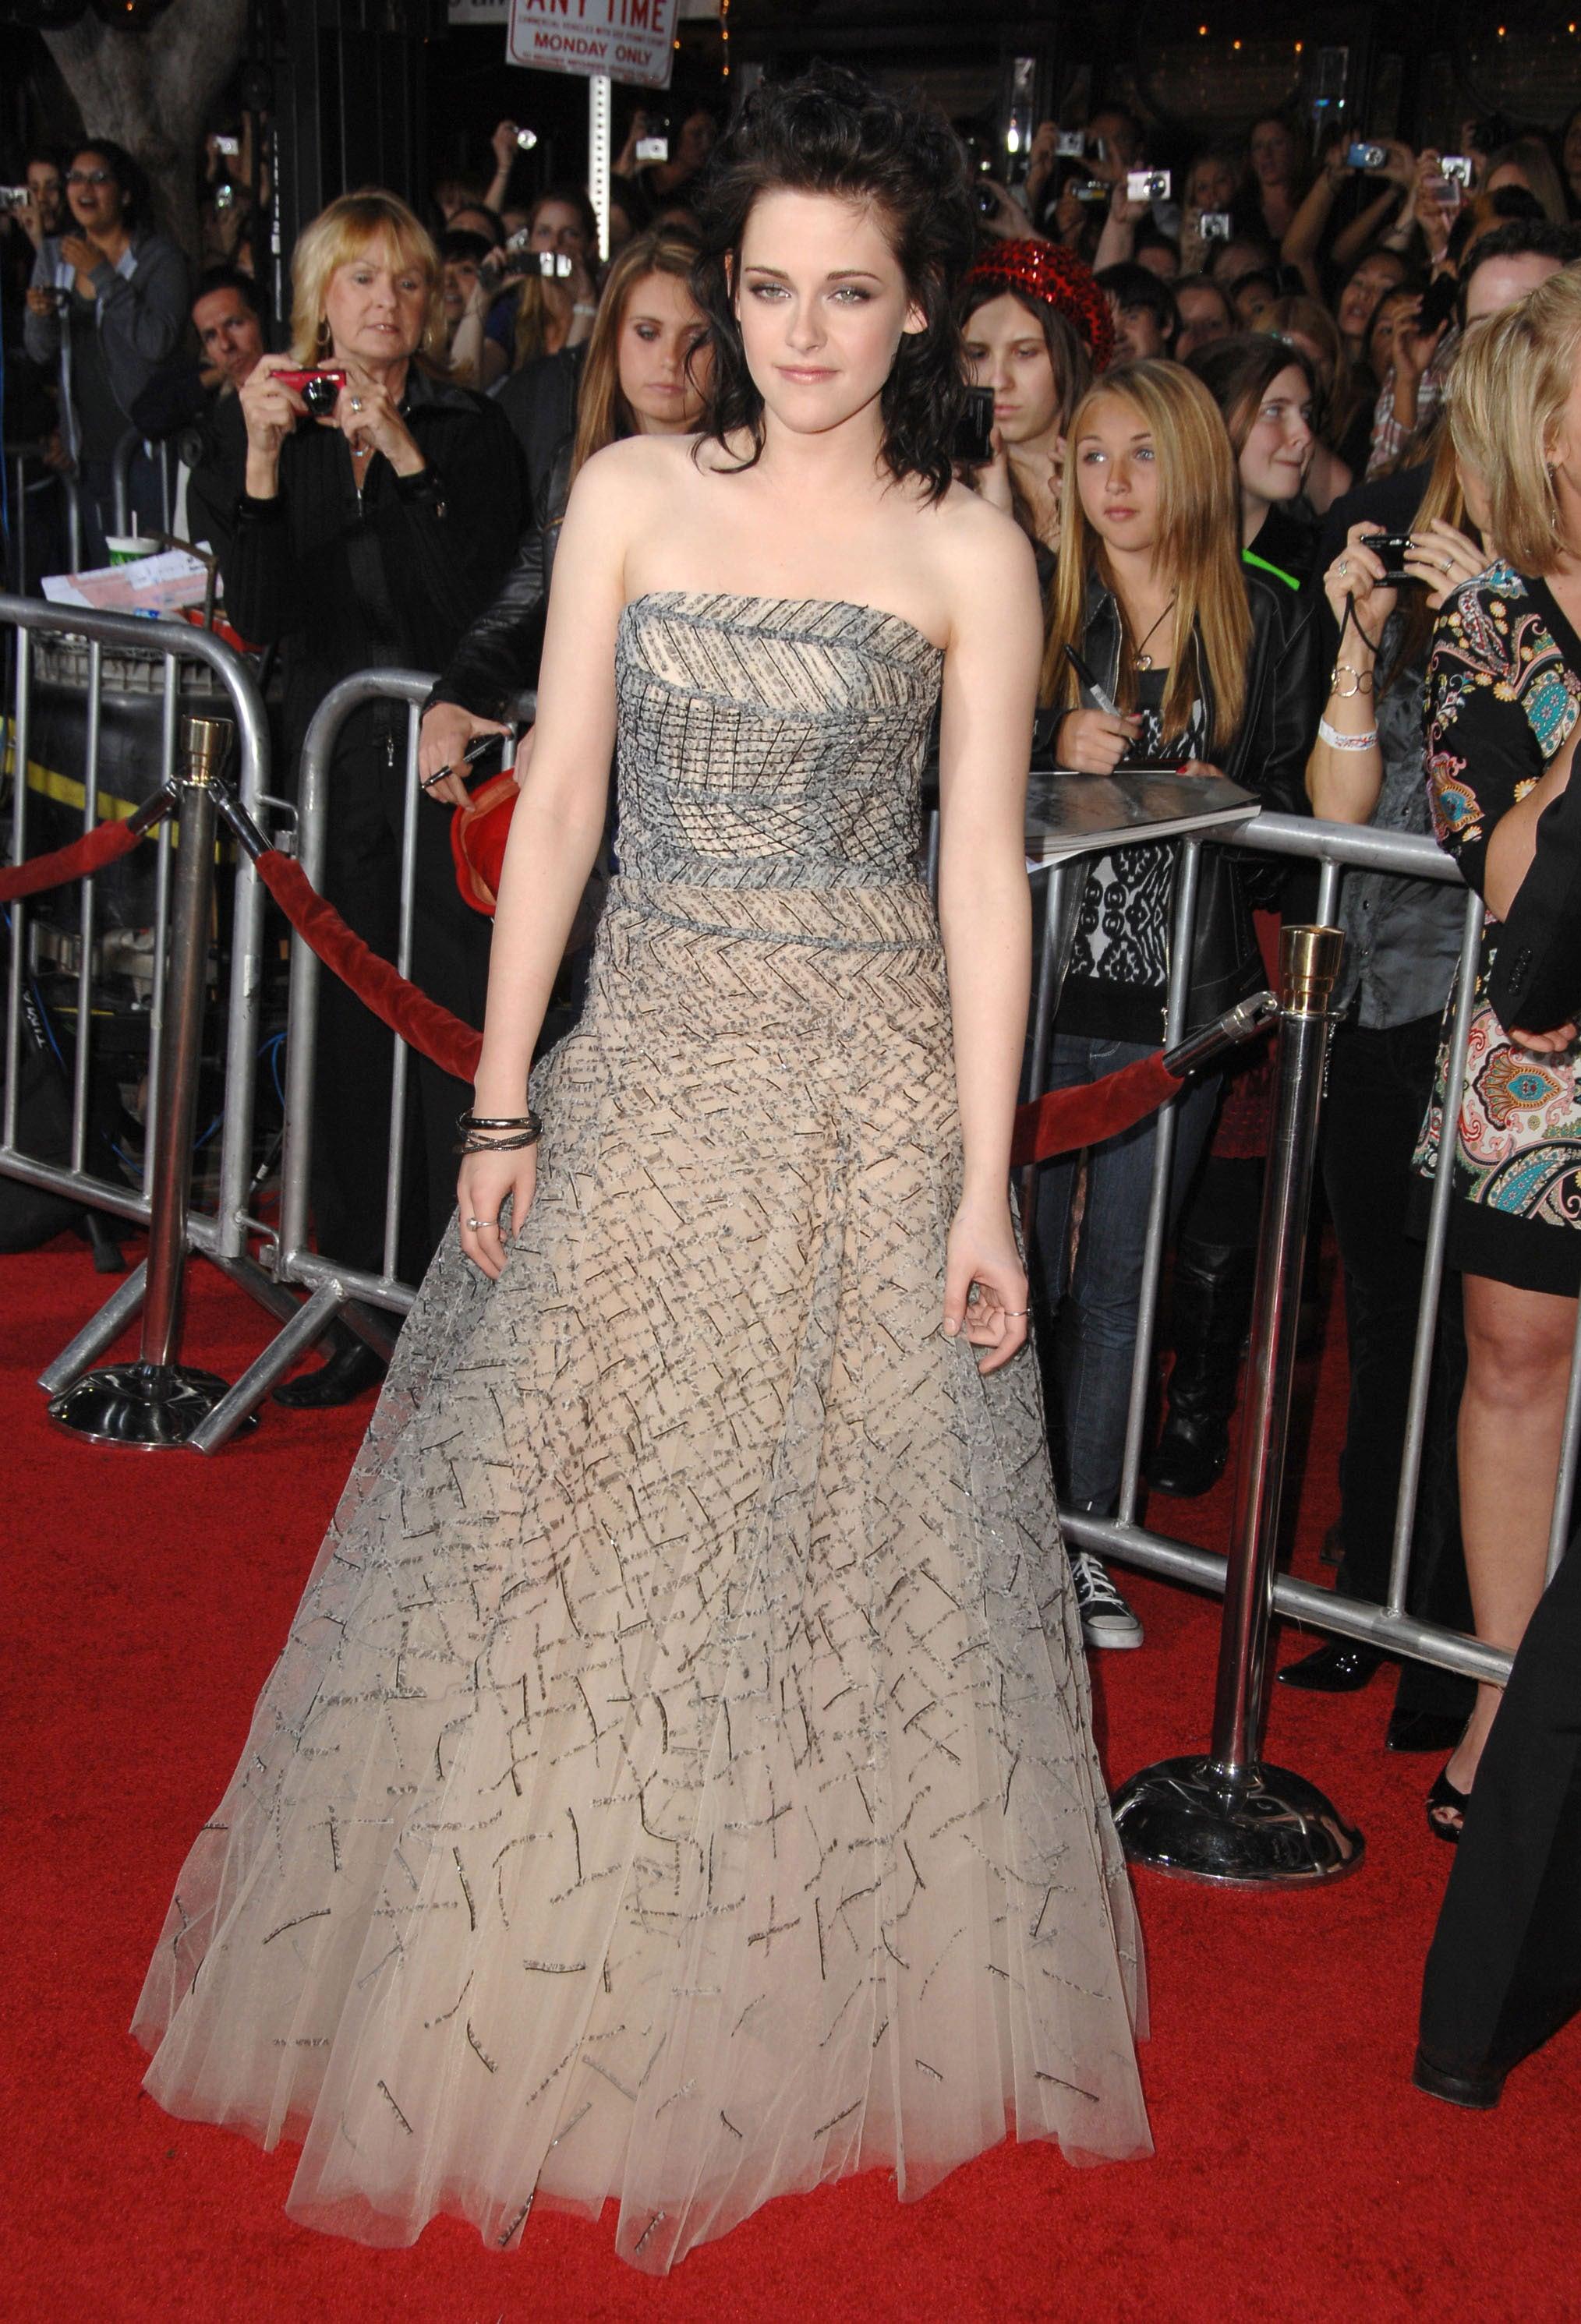 Stewart chose a showstopping Oscar de la Renta gown for the LA premiere of New Moon in November 2009.